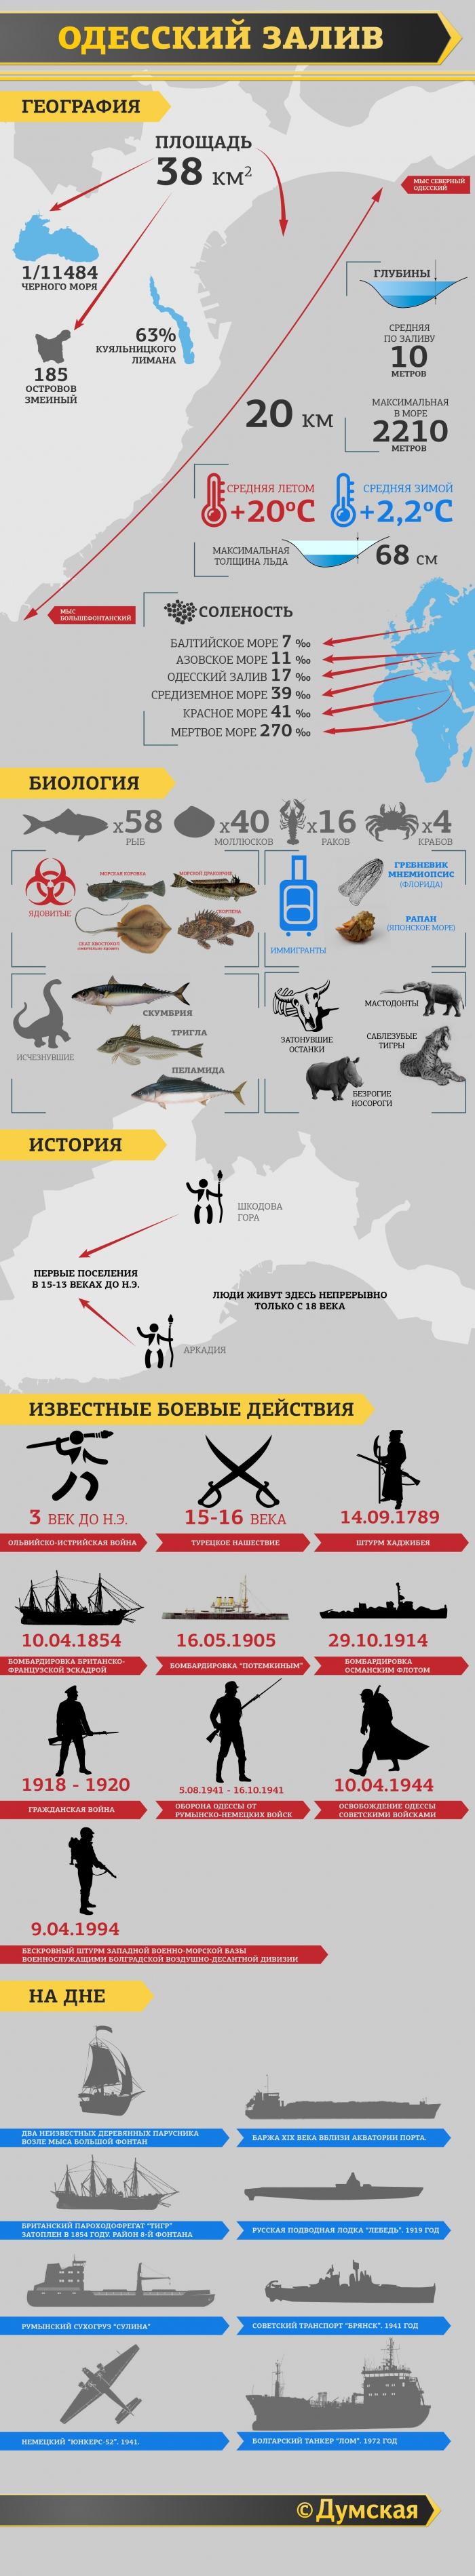 http://dumskaya.net/pics/a3/picturepicture_37454239156934_96203.jpg